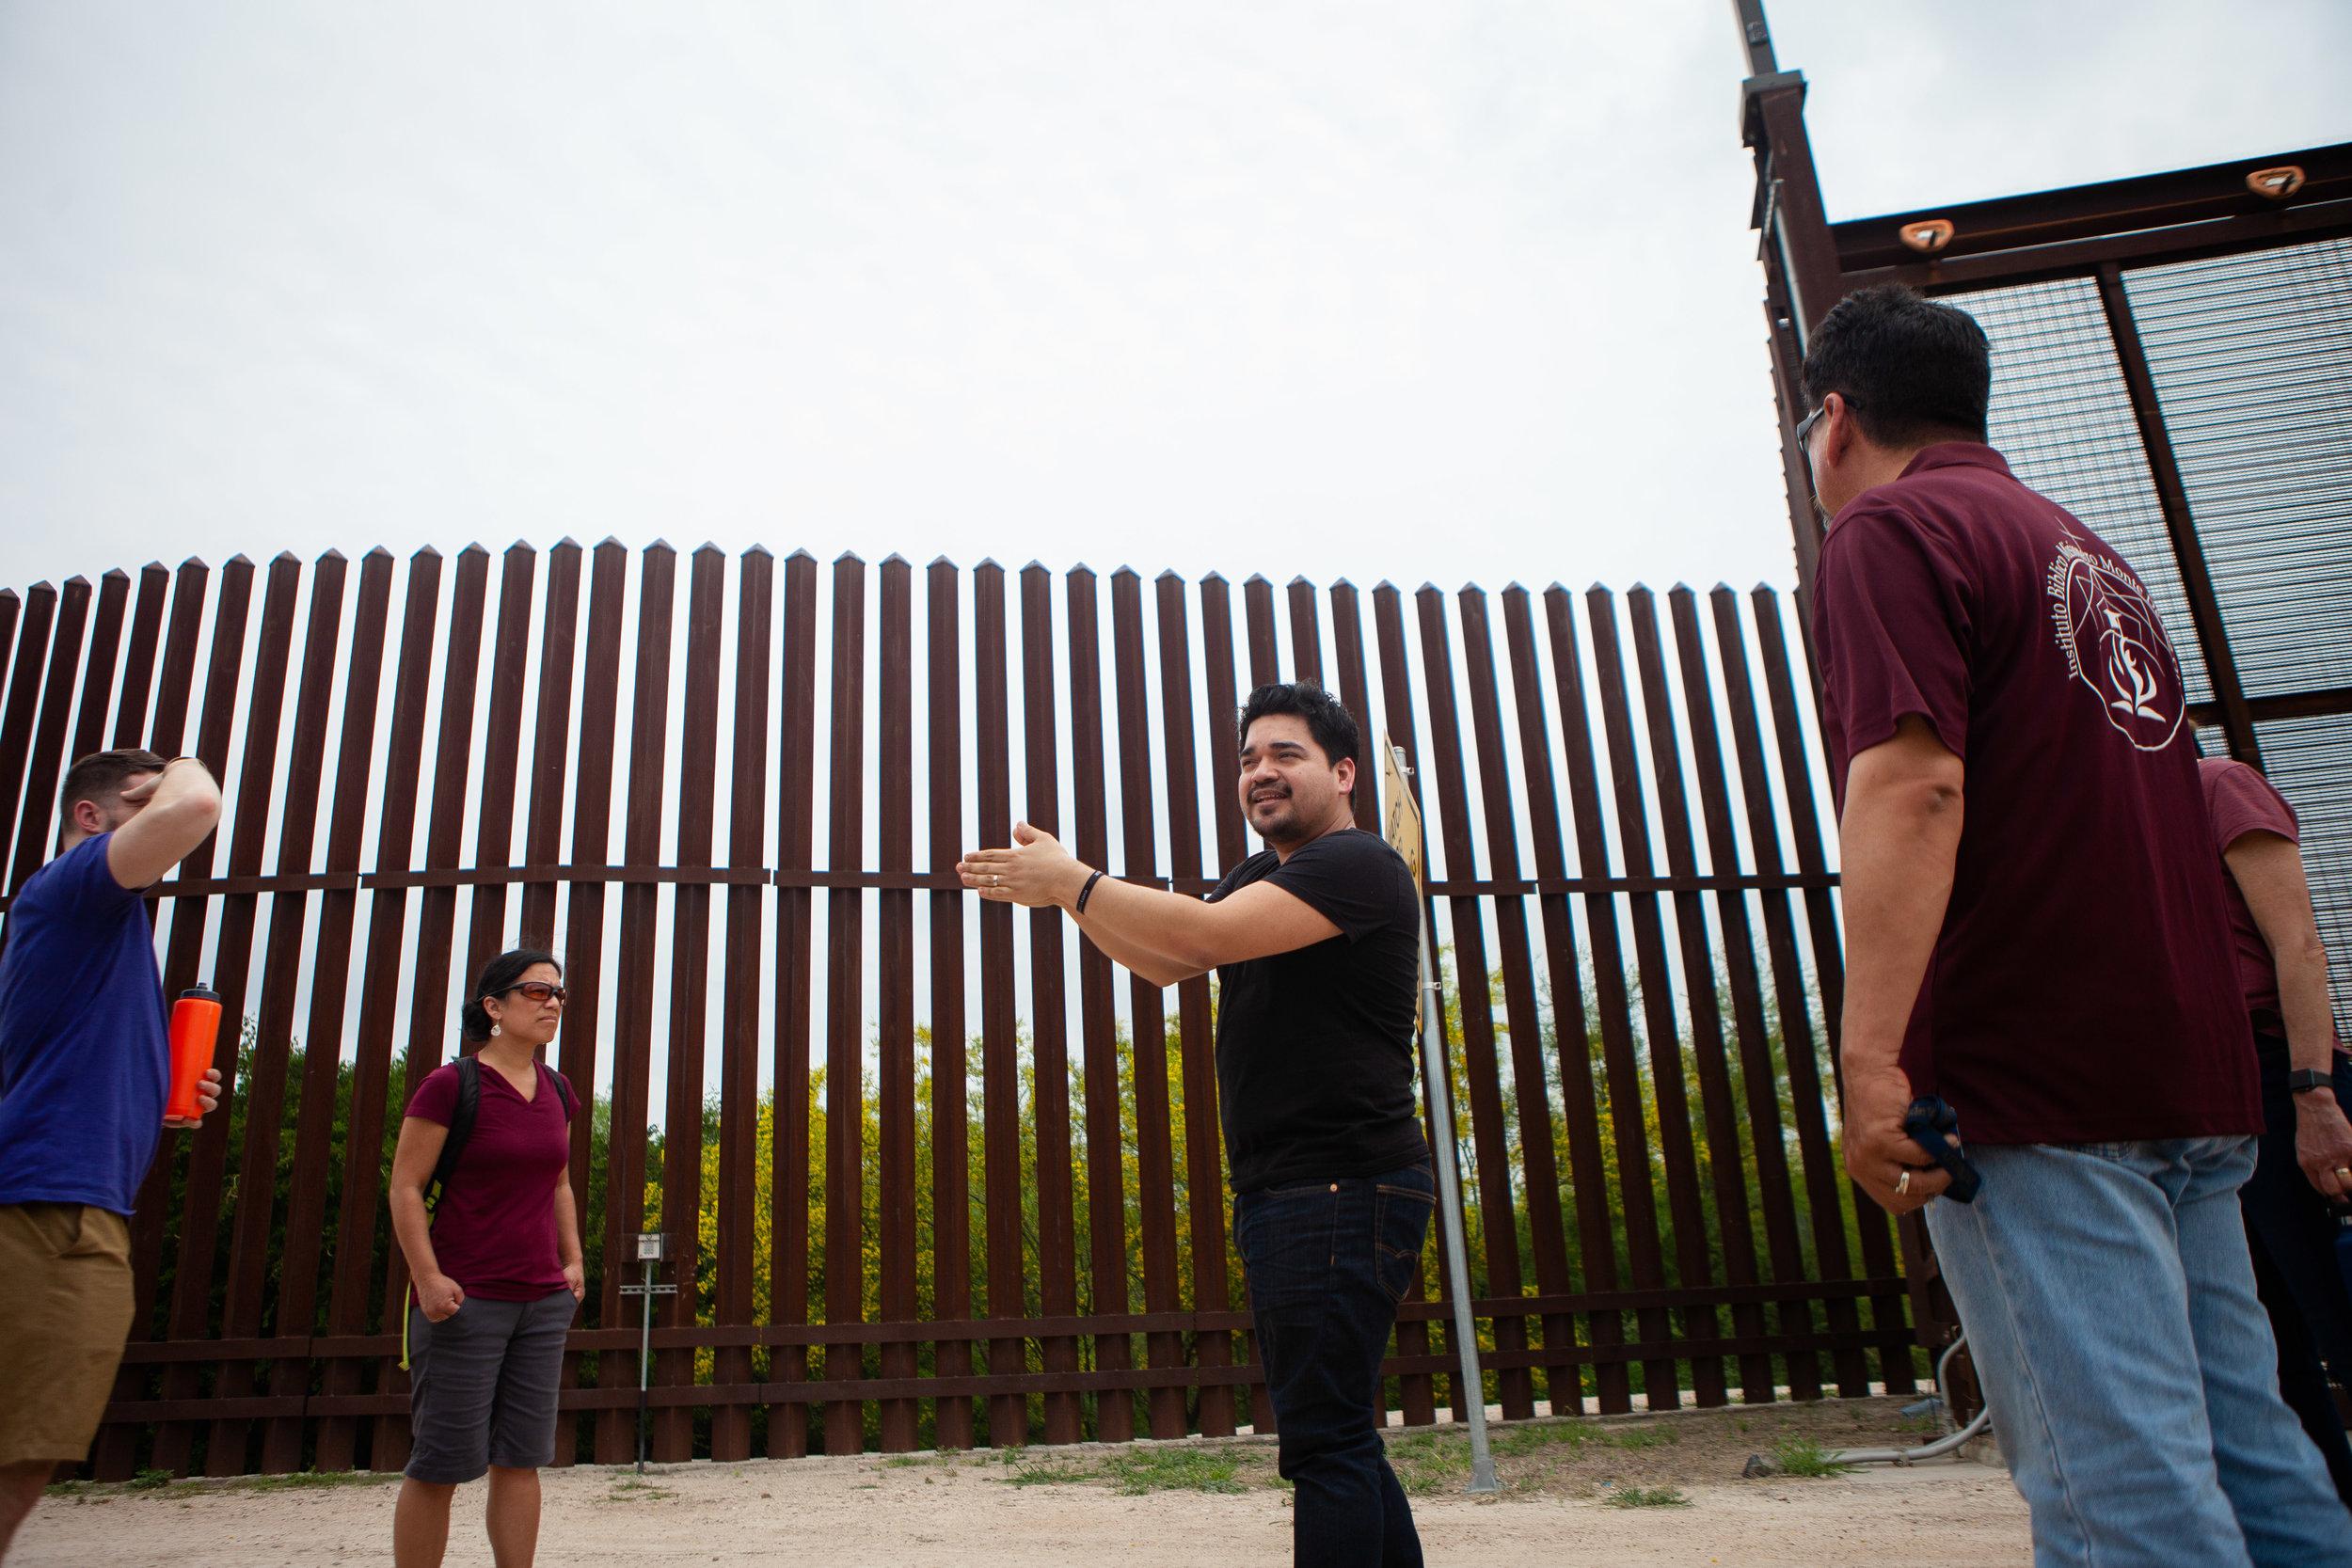 Border_Perspective-77 (1).JPG